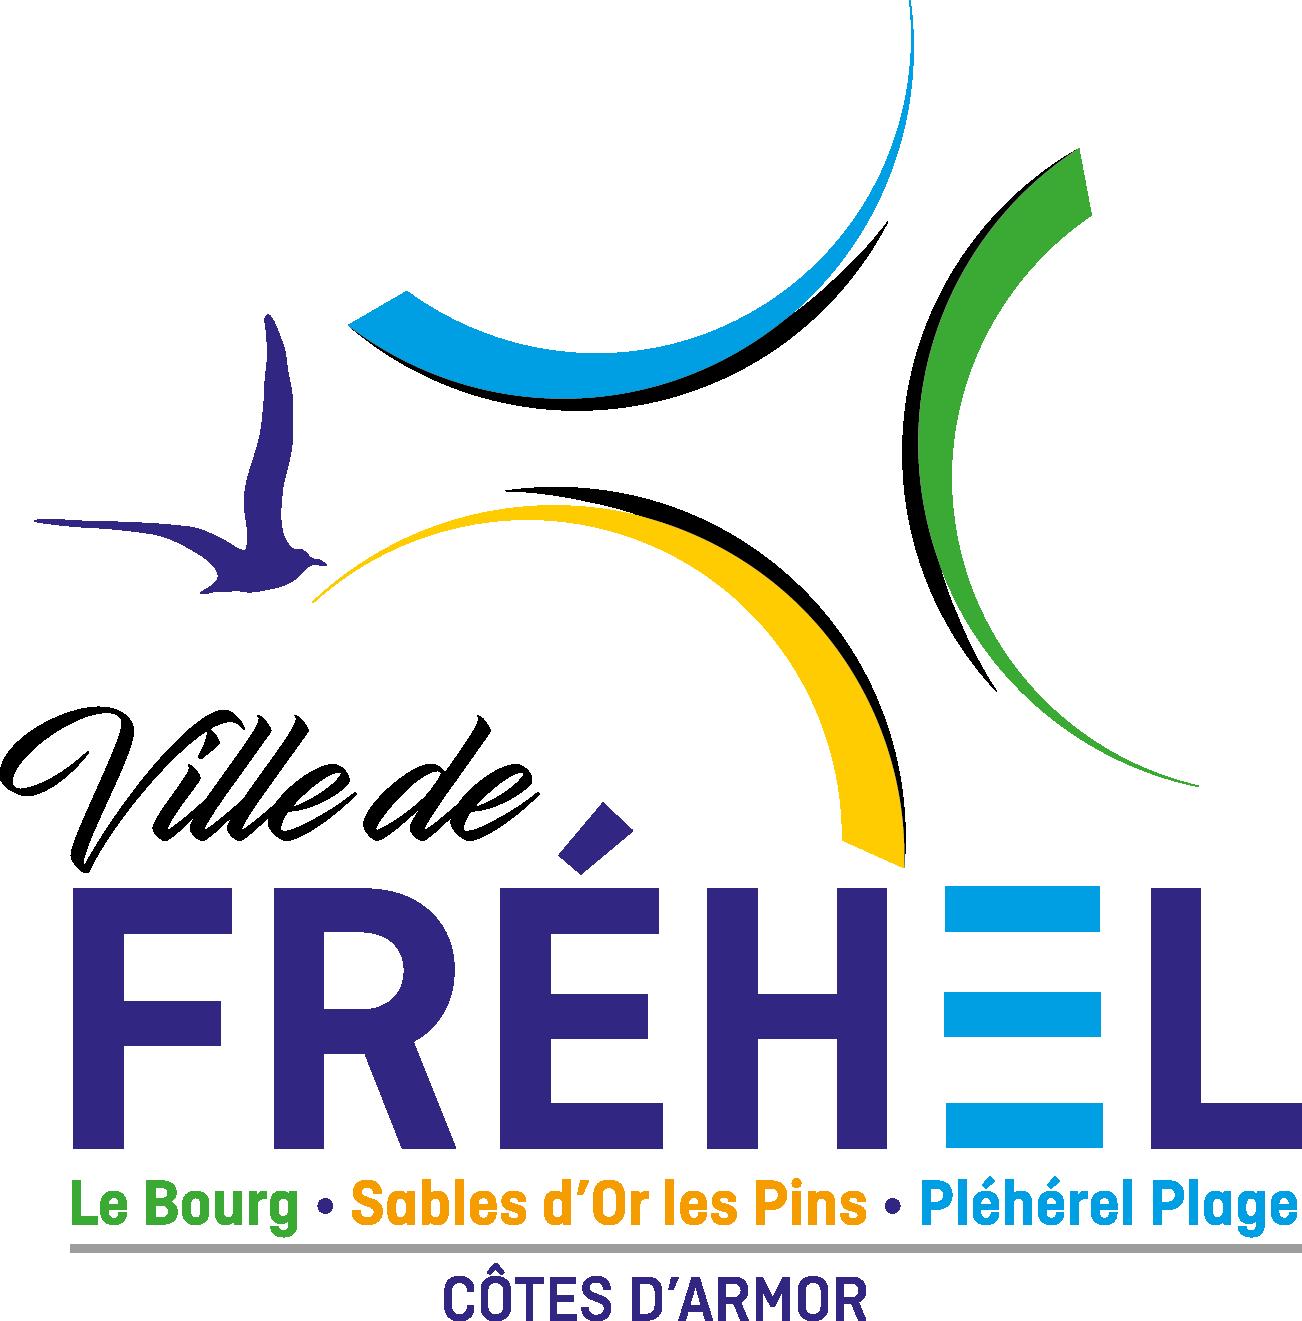 Logo Frehel Bon.png